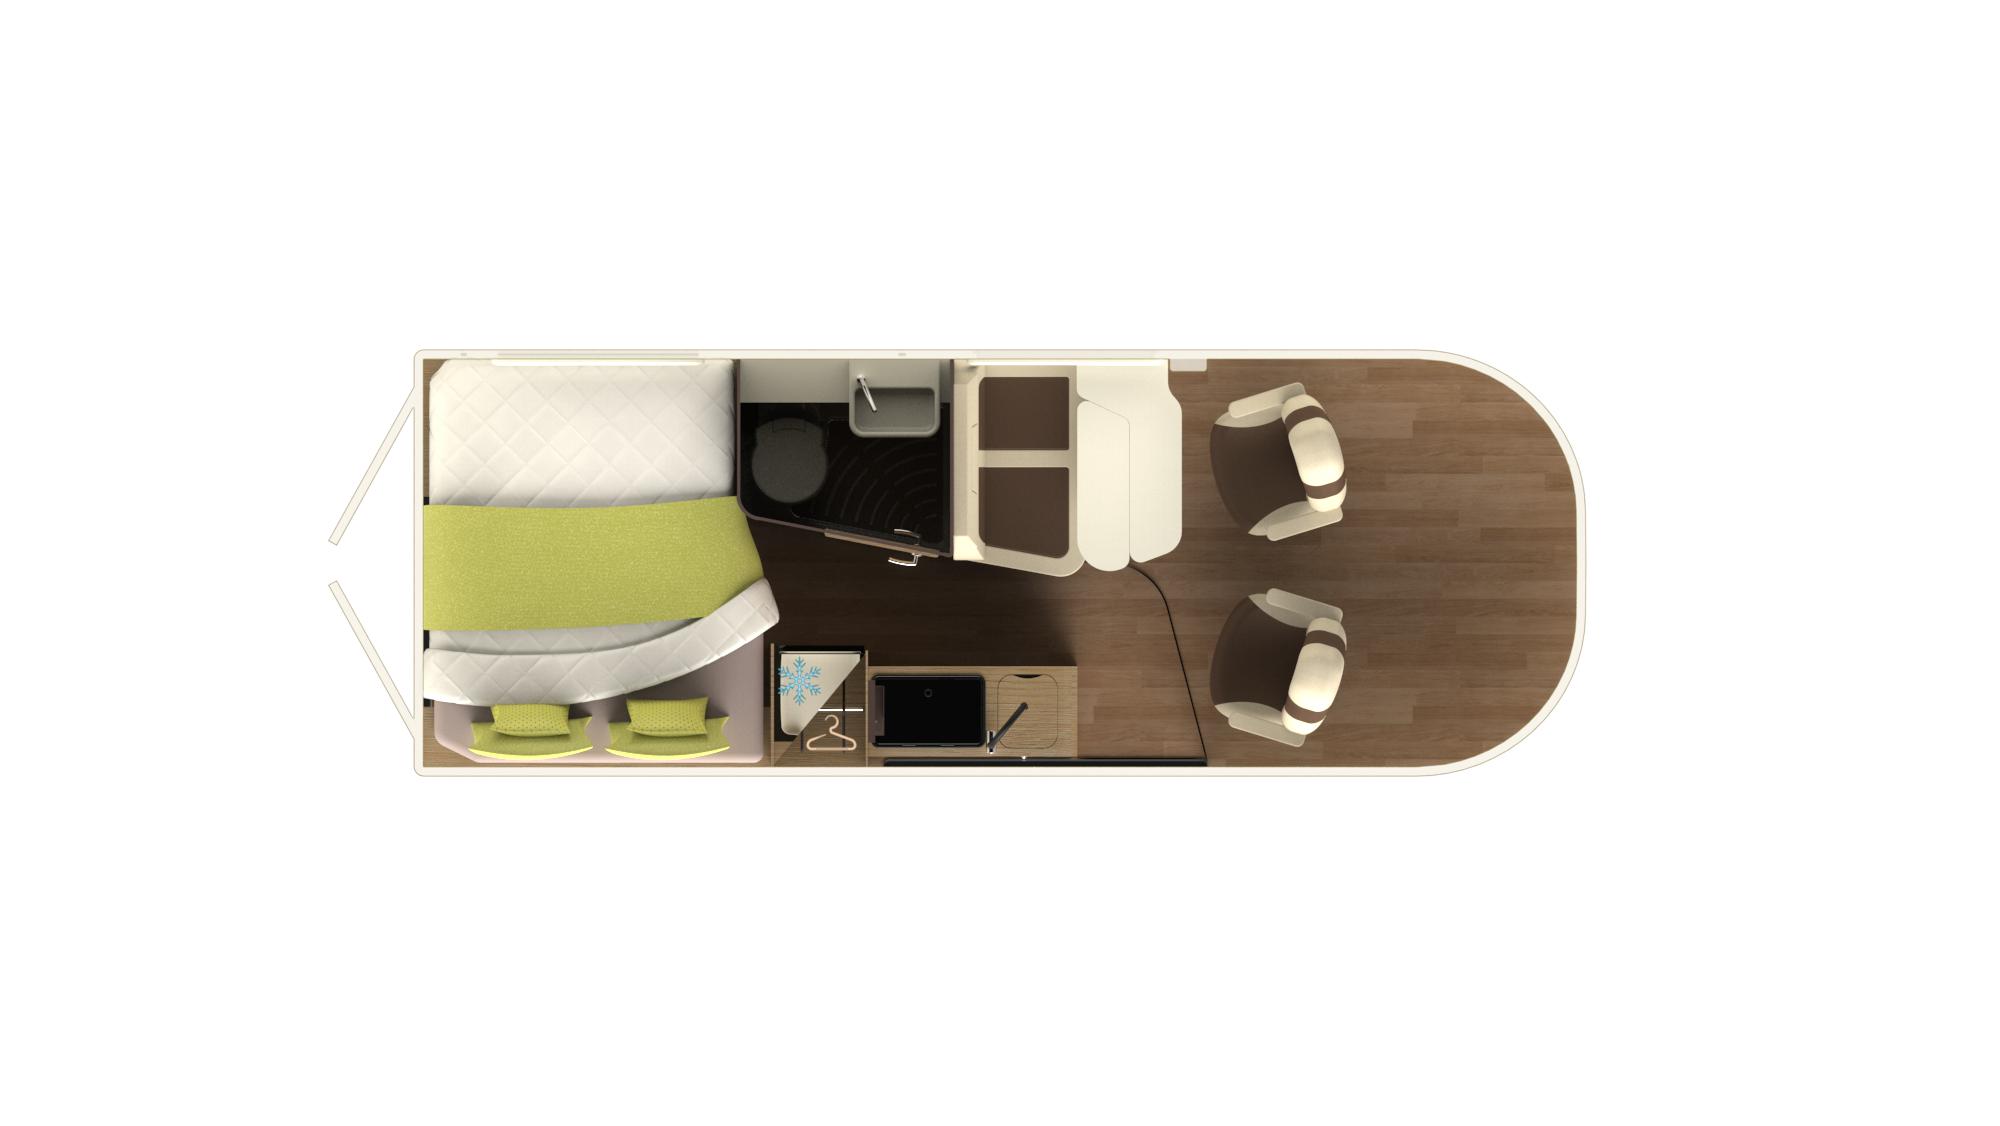 Van V590 LT Design Edition